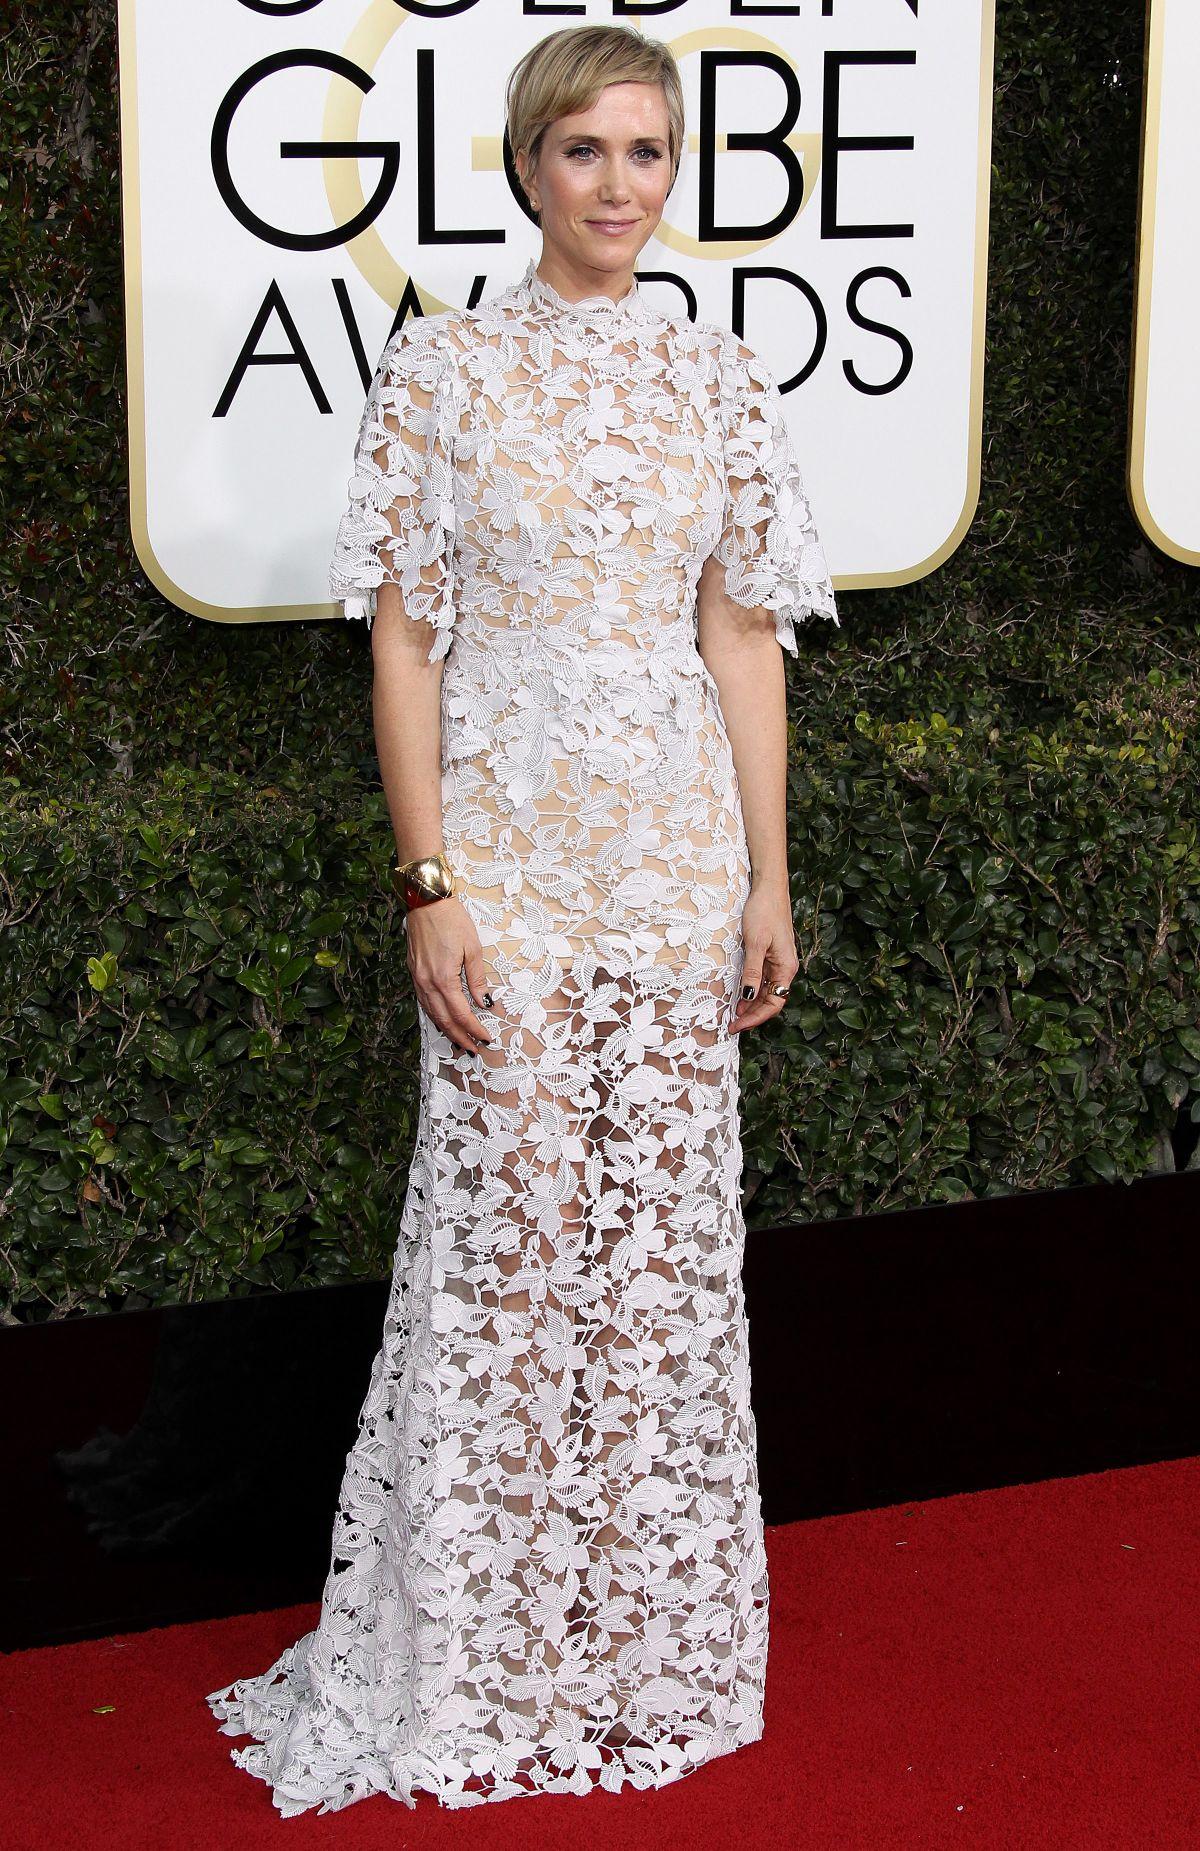 KRISTEN WIIG at 74th Annual Golden Globe Awards in Beverly Hills 01/08/2017